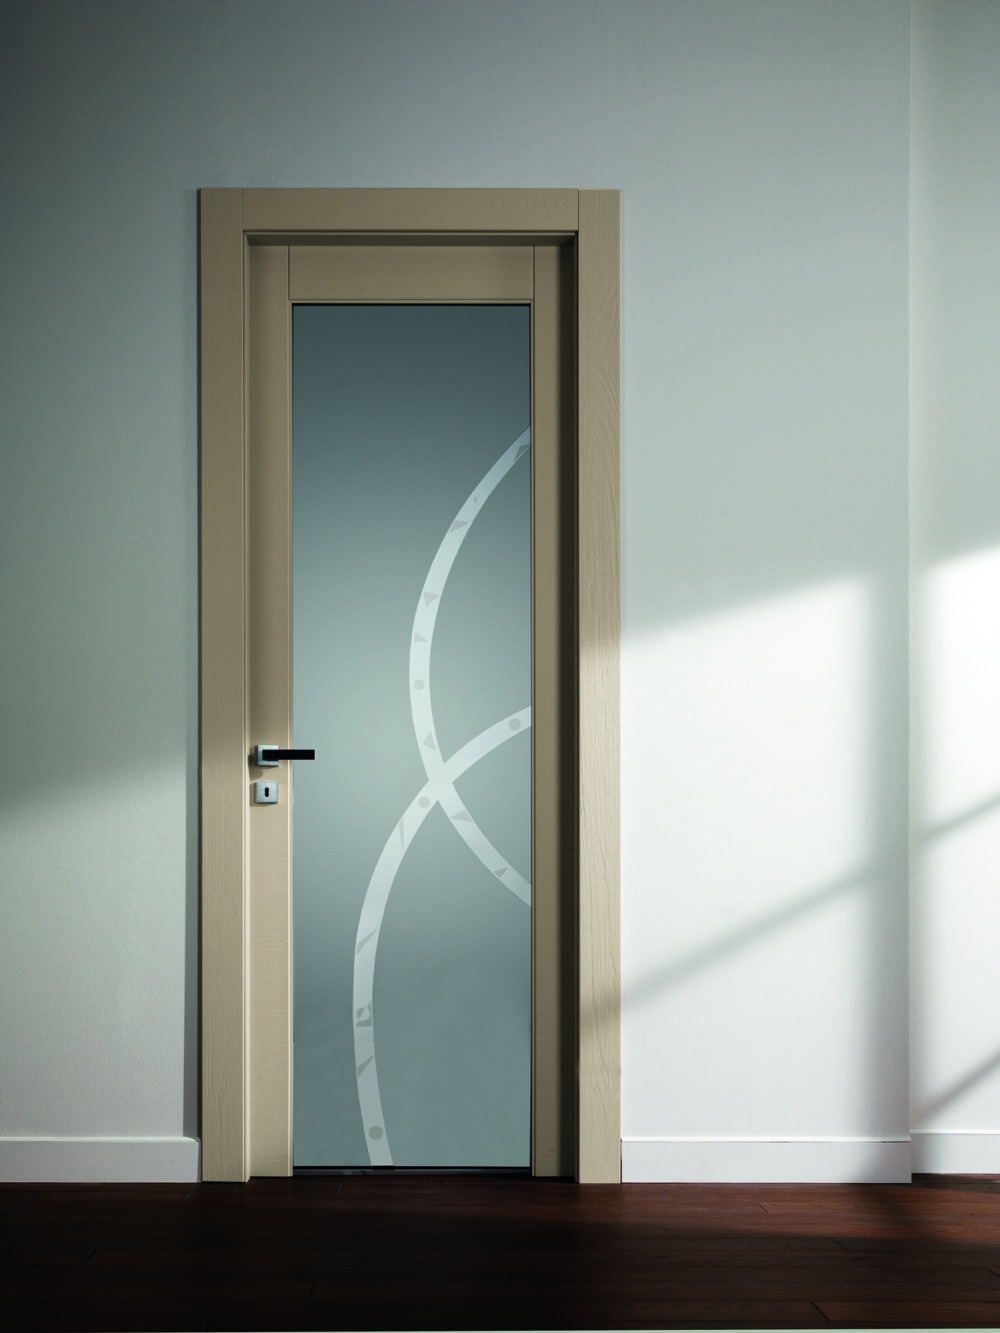 Porta stile classico legno Arca Garofoli - Garofoli